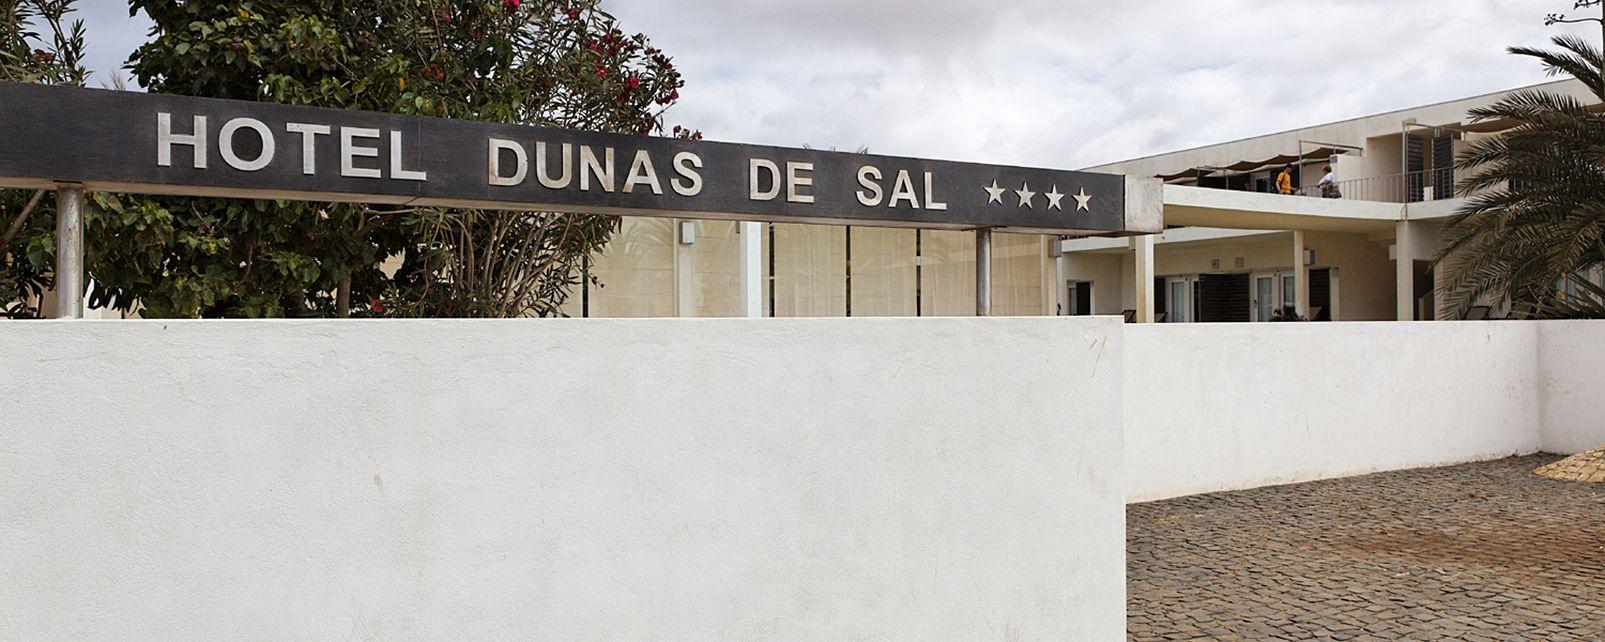 Hôtel Dunas De Sal